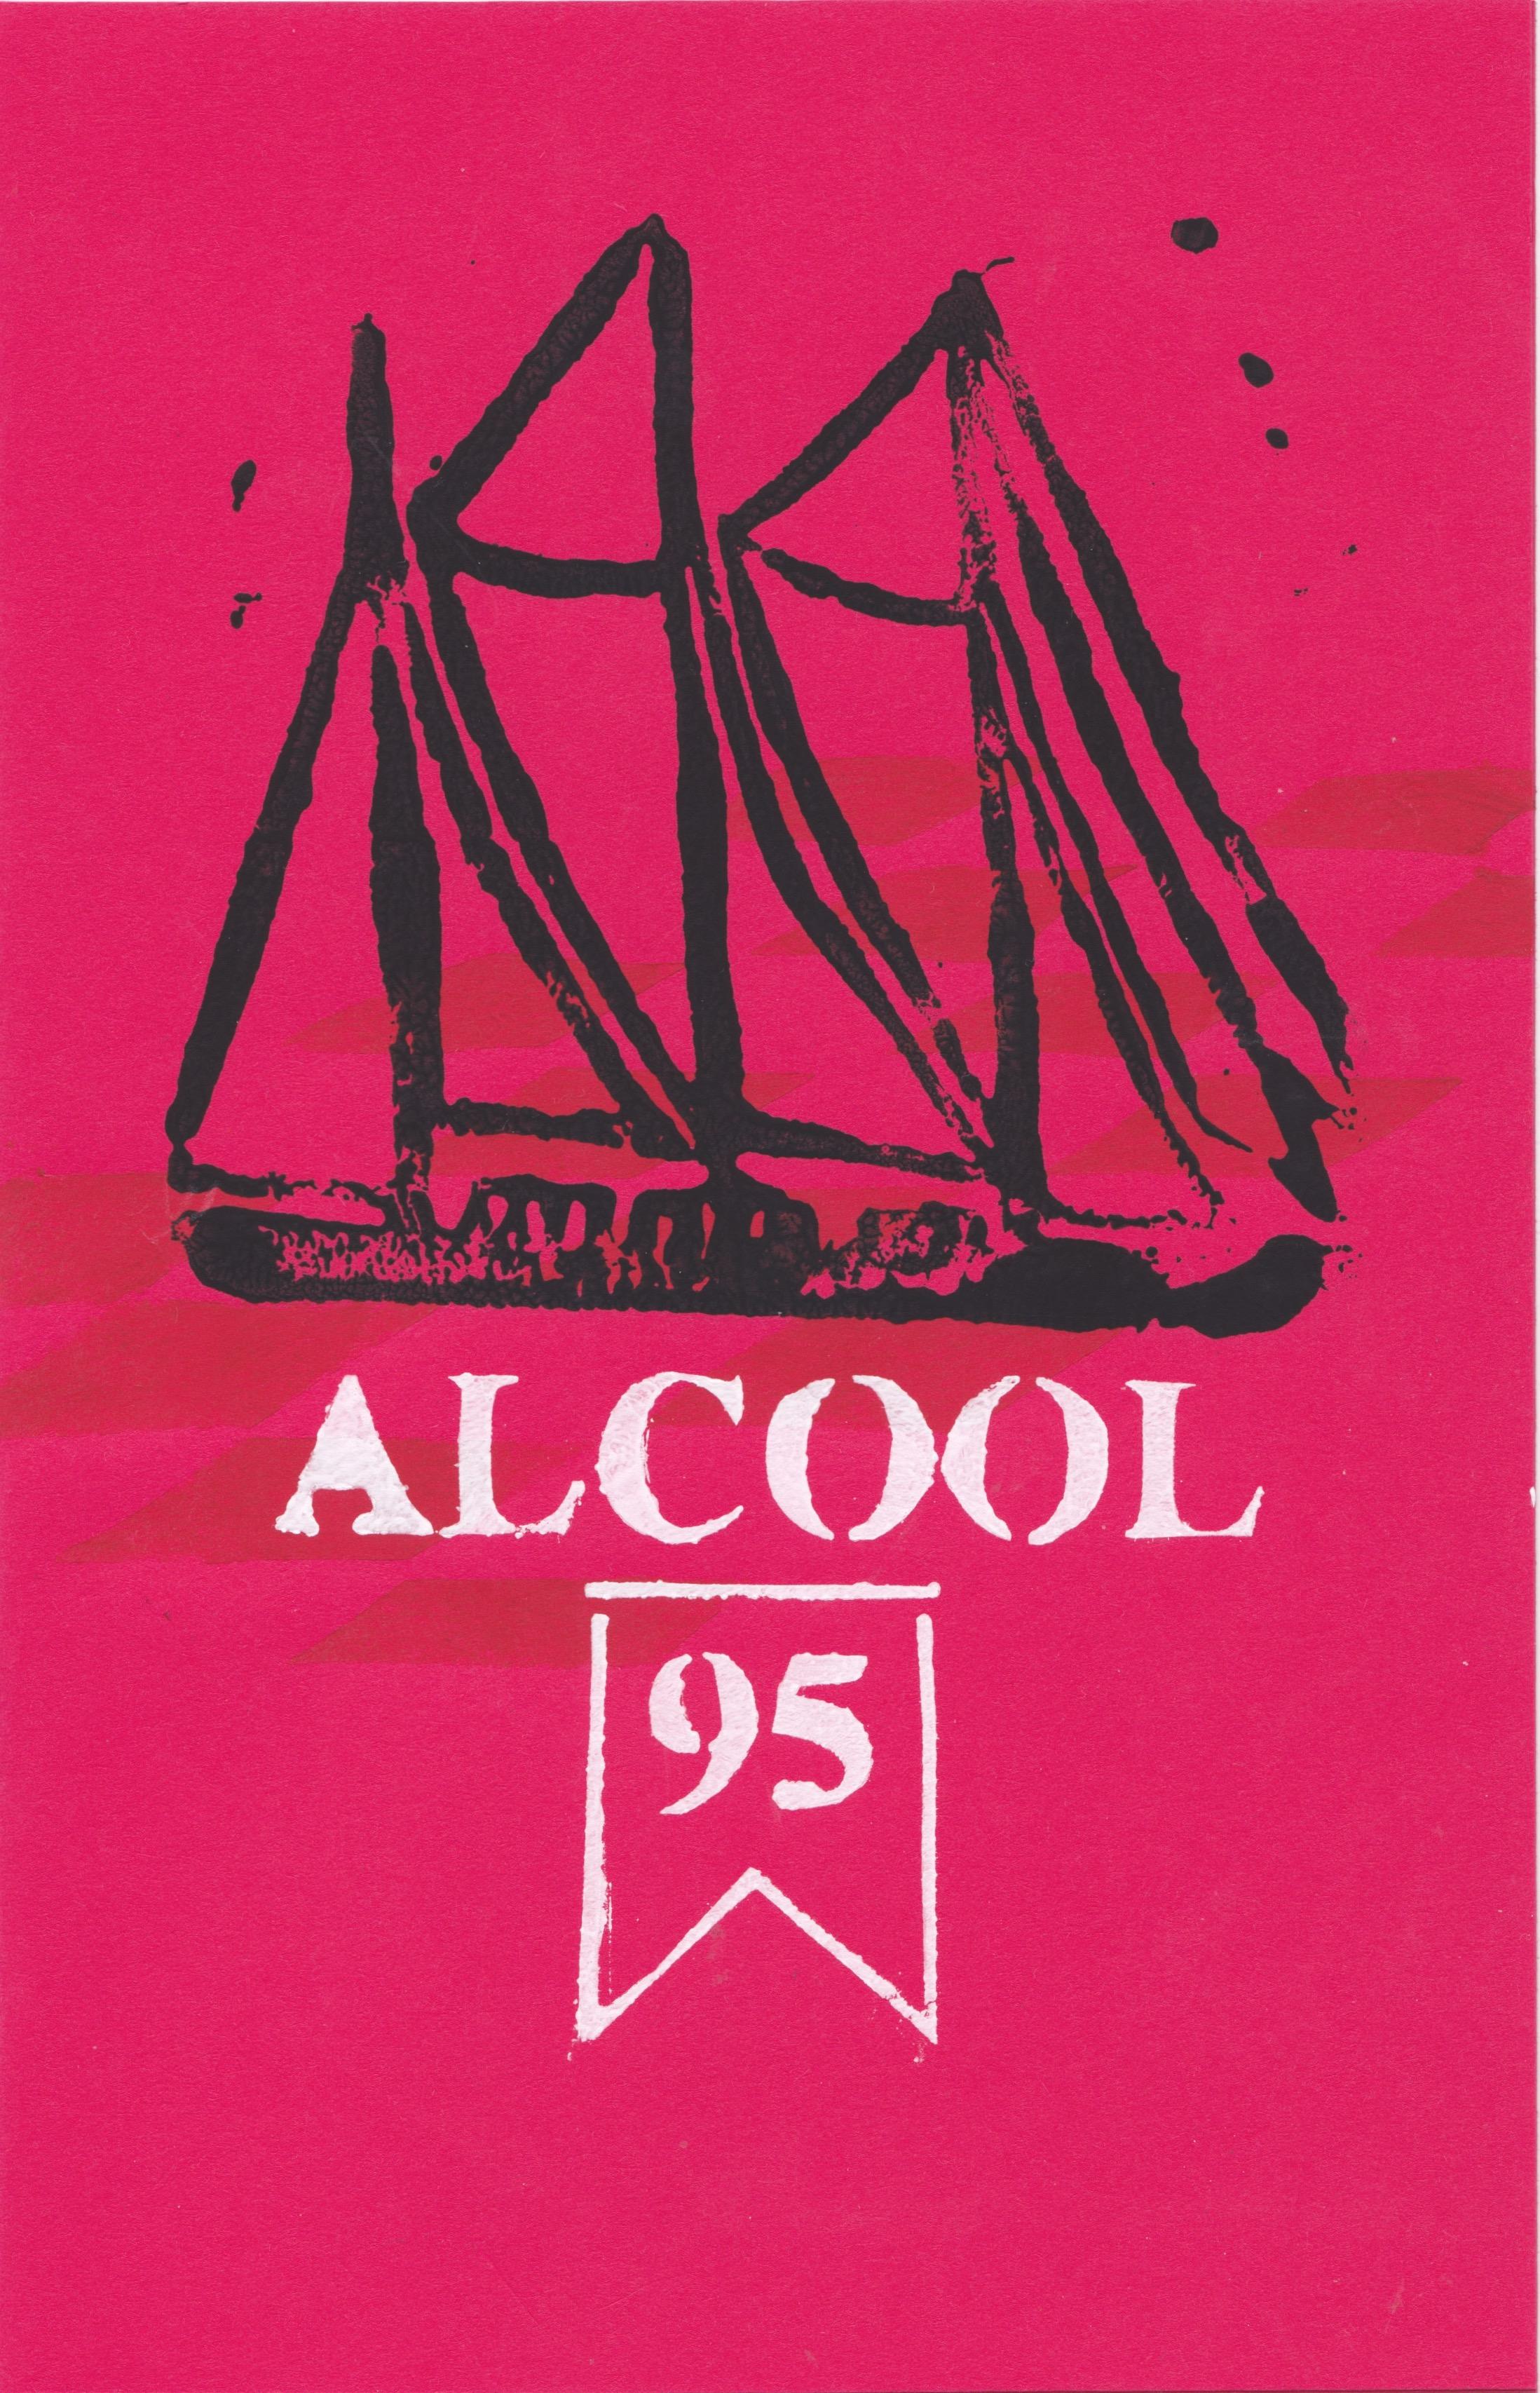 Alcool 95